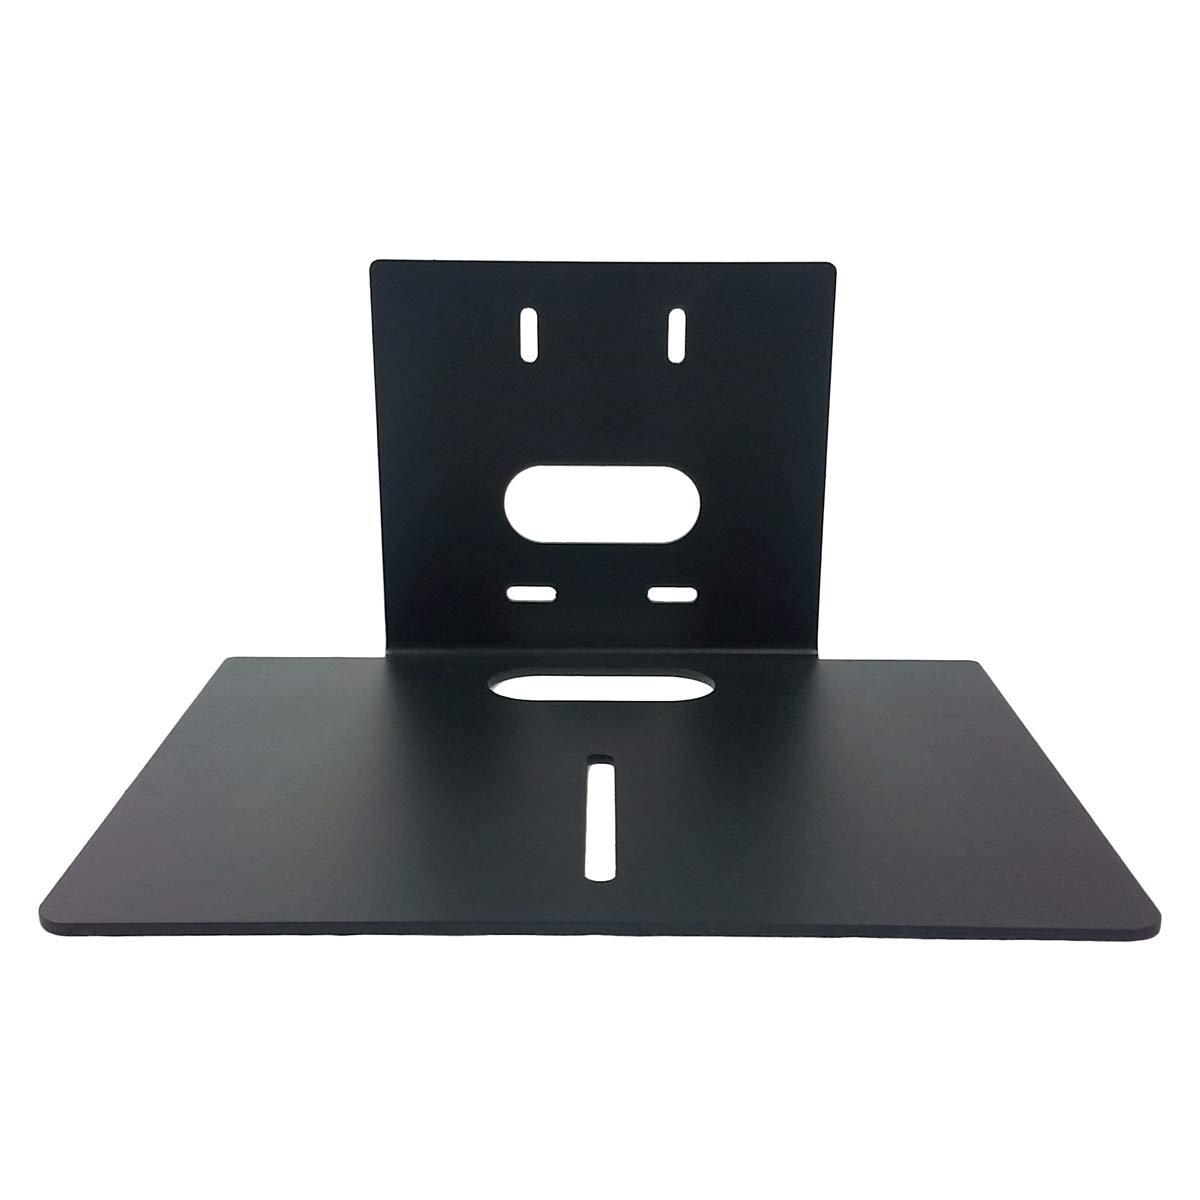 HuddleCamHD HCM-2-BK | Large Universal Wall Mount for PTZ 3X 10X Vaddio Sony Air Cameras Black by HuddleCamHD